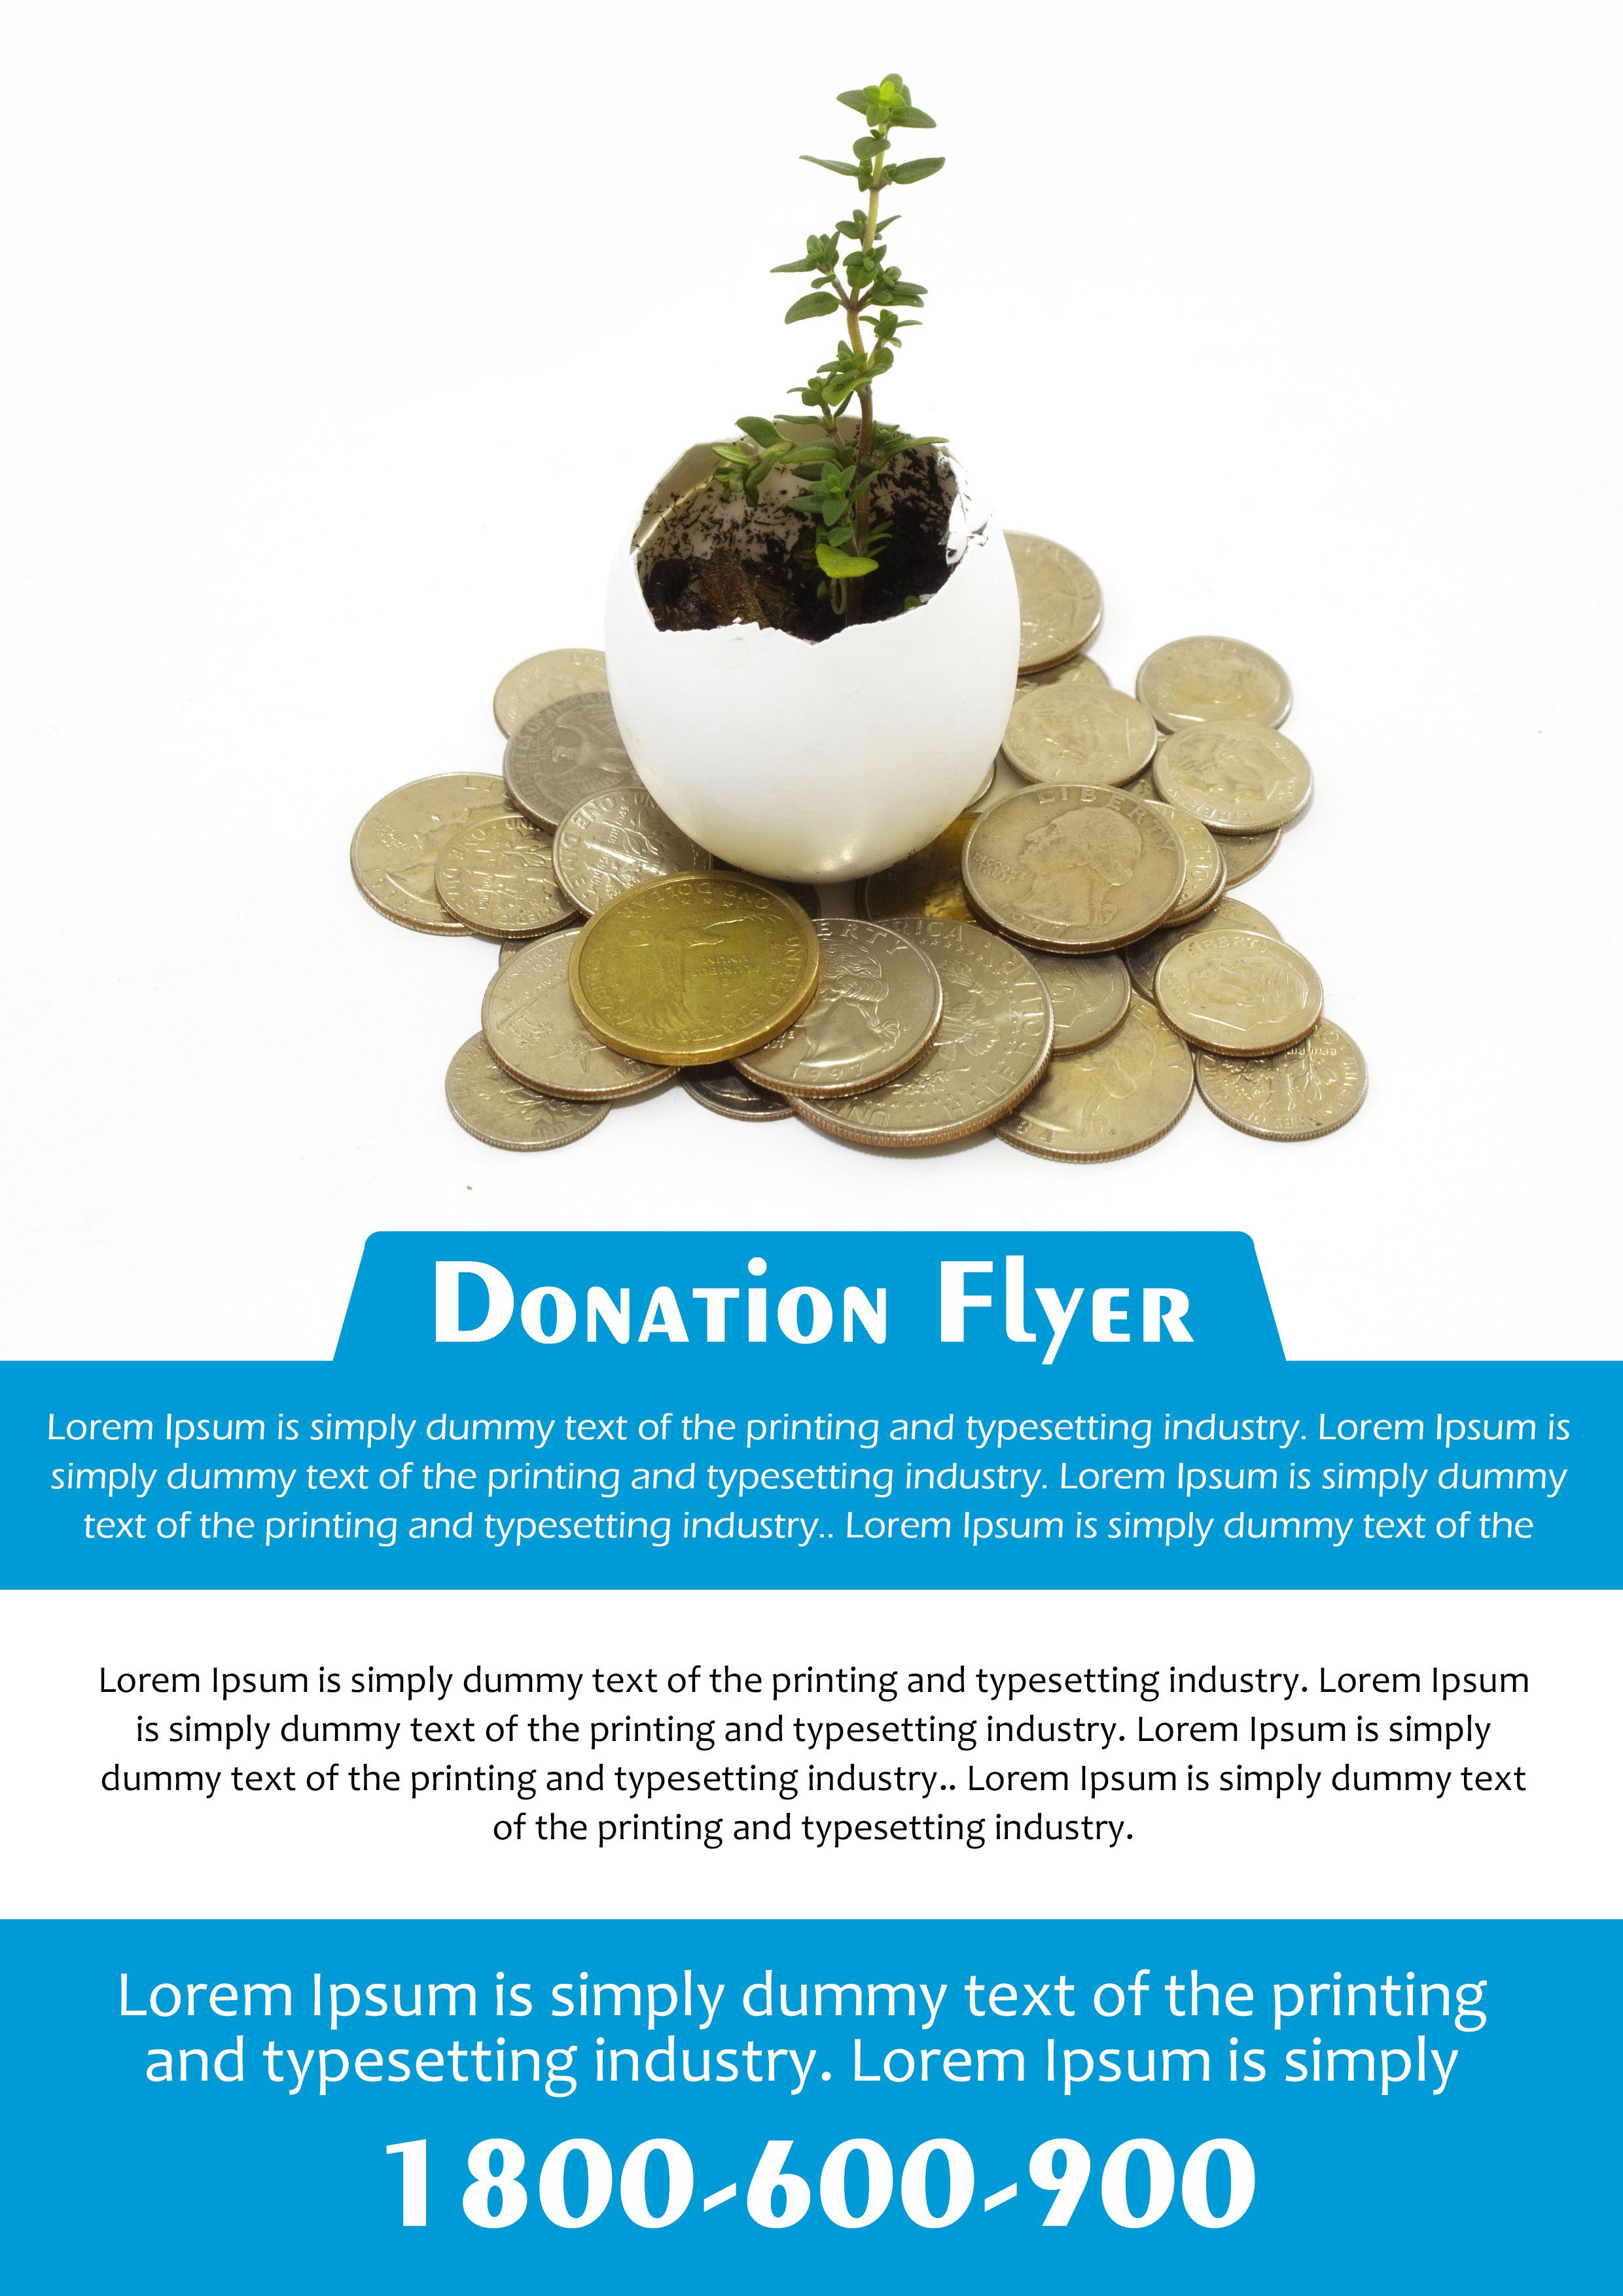 donation flyer samples